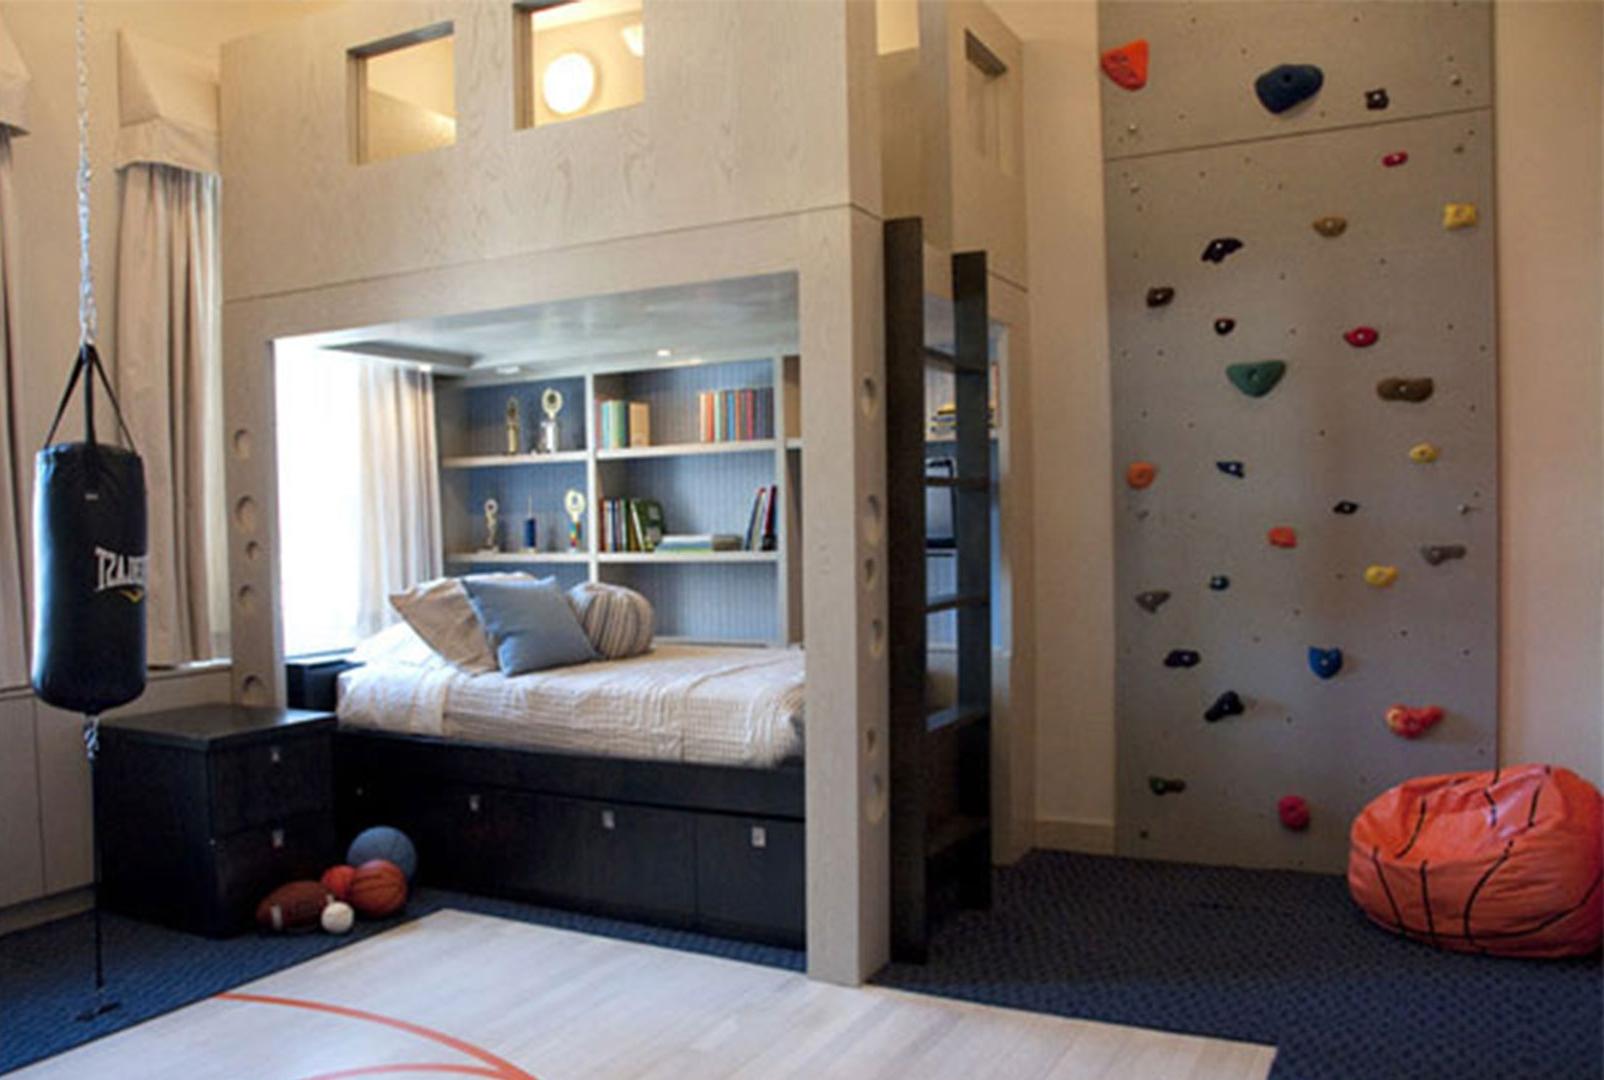 Bedroom Ideas For 10Yr Old Boy boys bedroom furniture ideas | hawk haven